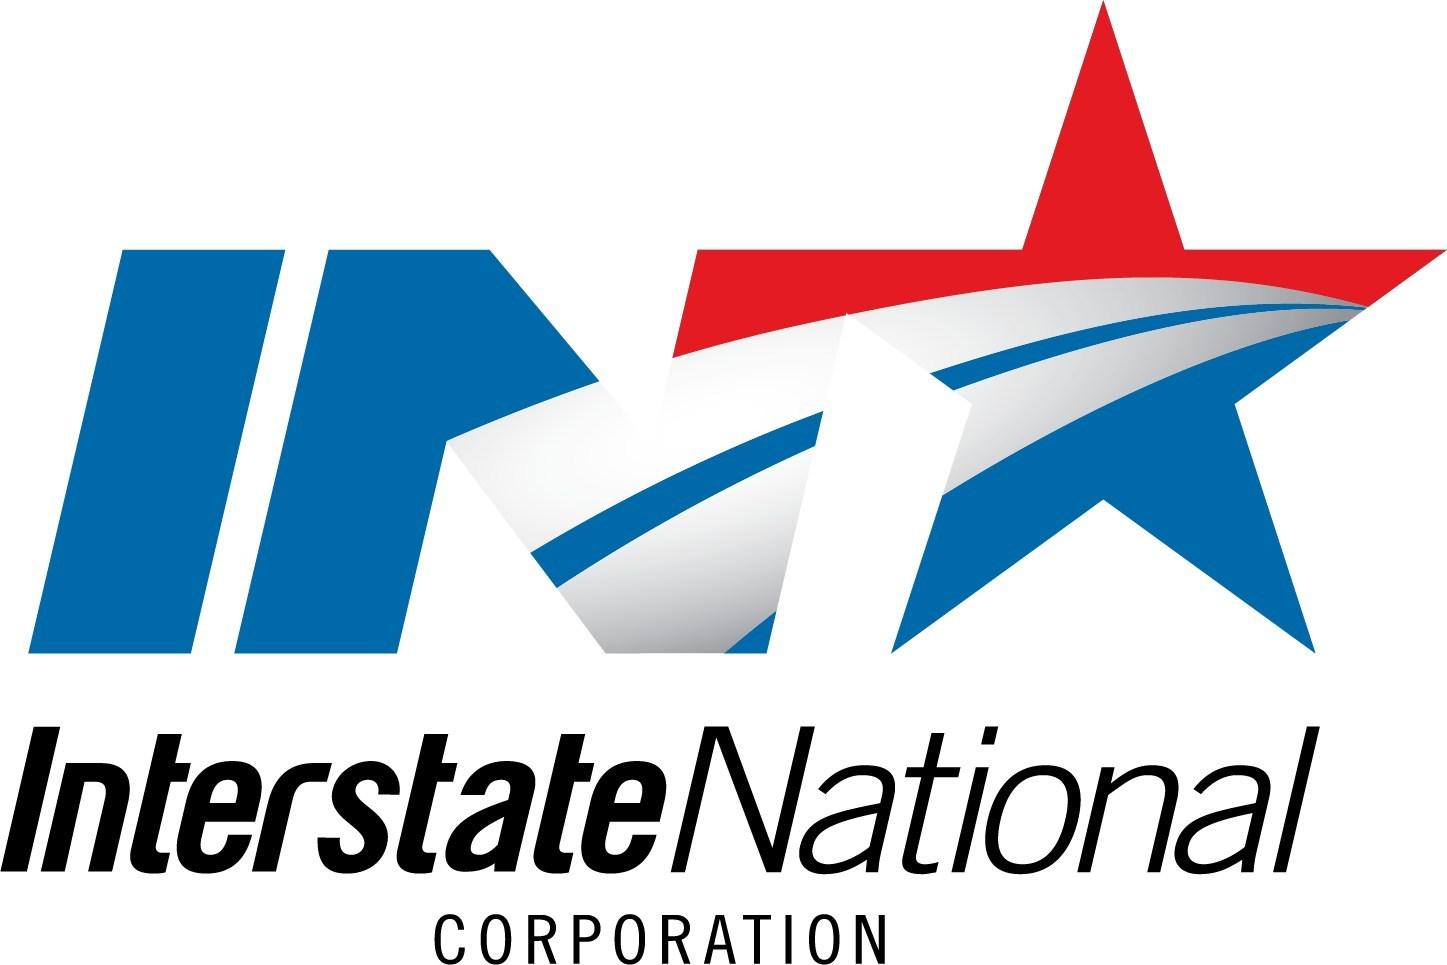 Interstate National